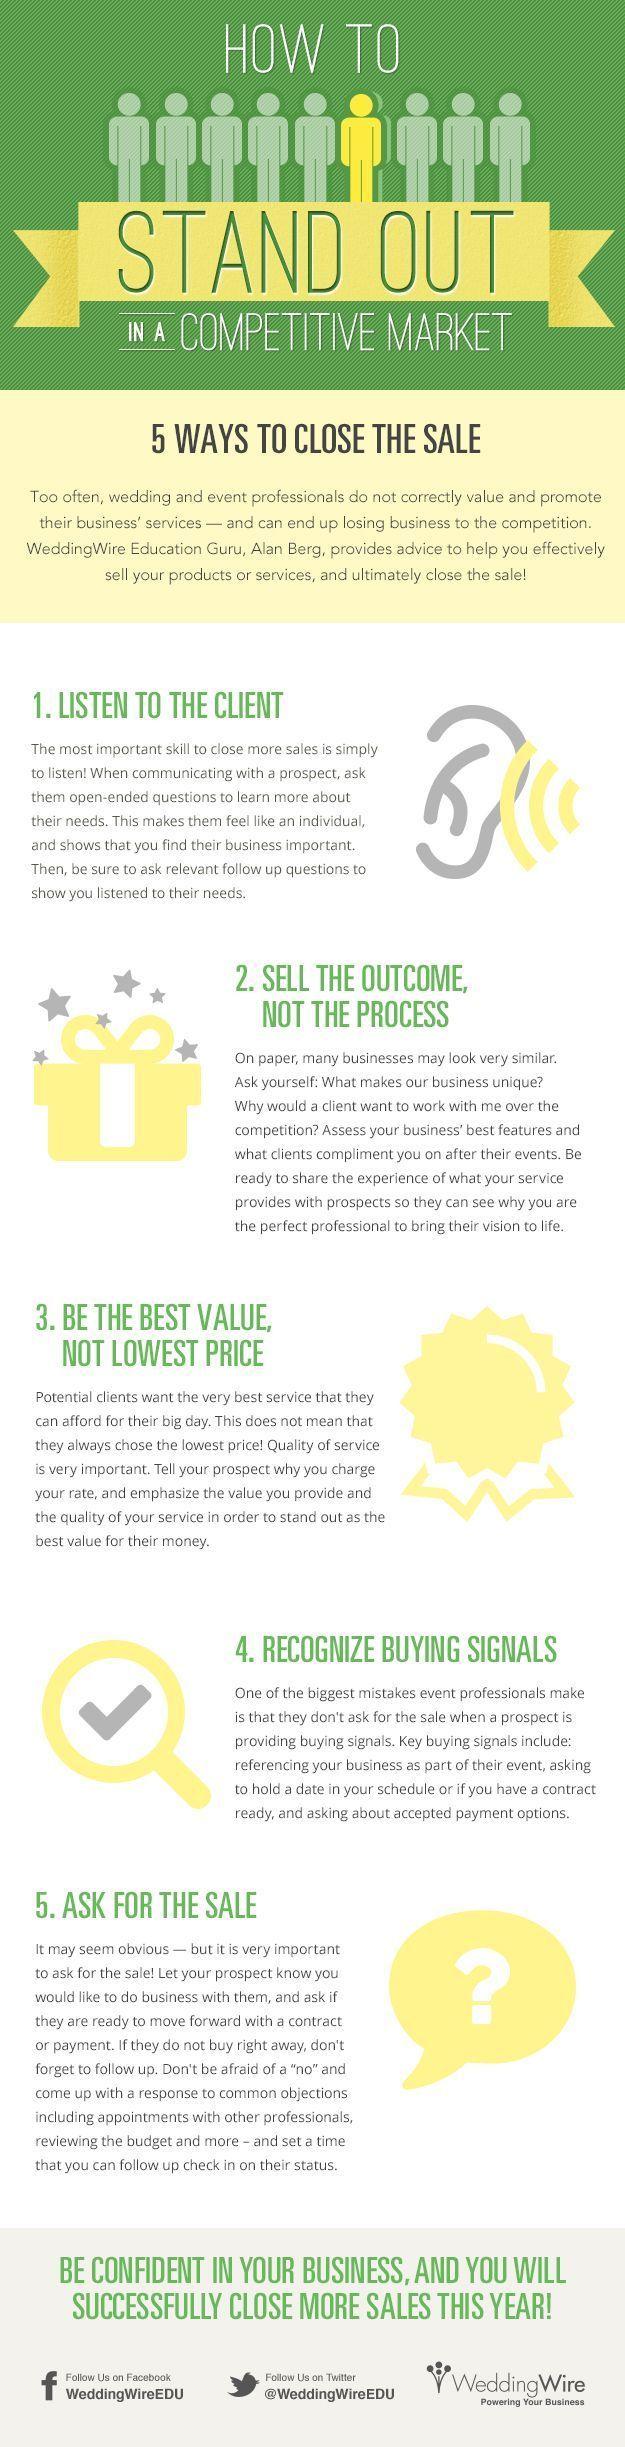 How to Stand Out in a Competitive Market | WeddingWire EDU BlogWeddingWire EDU Blog